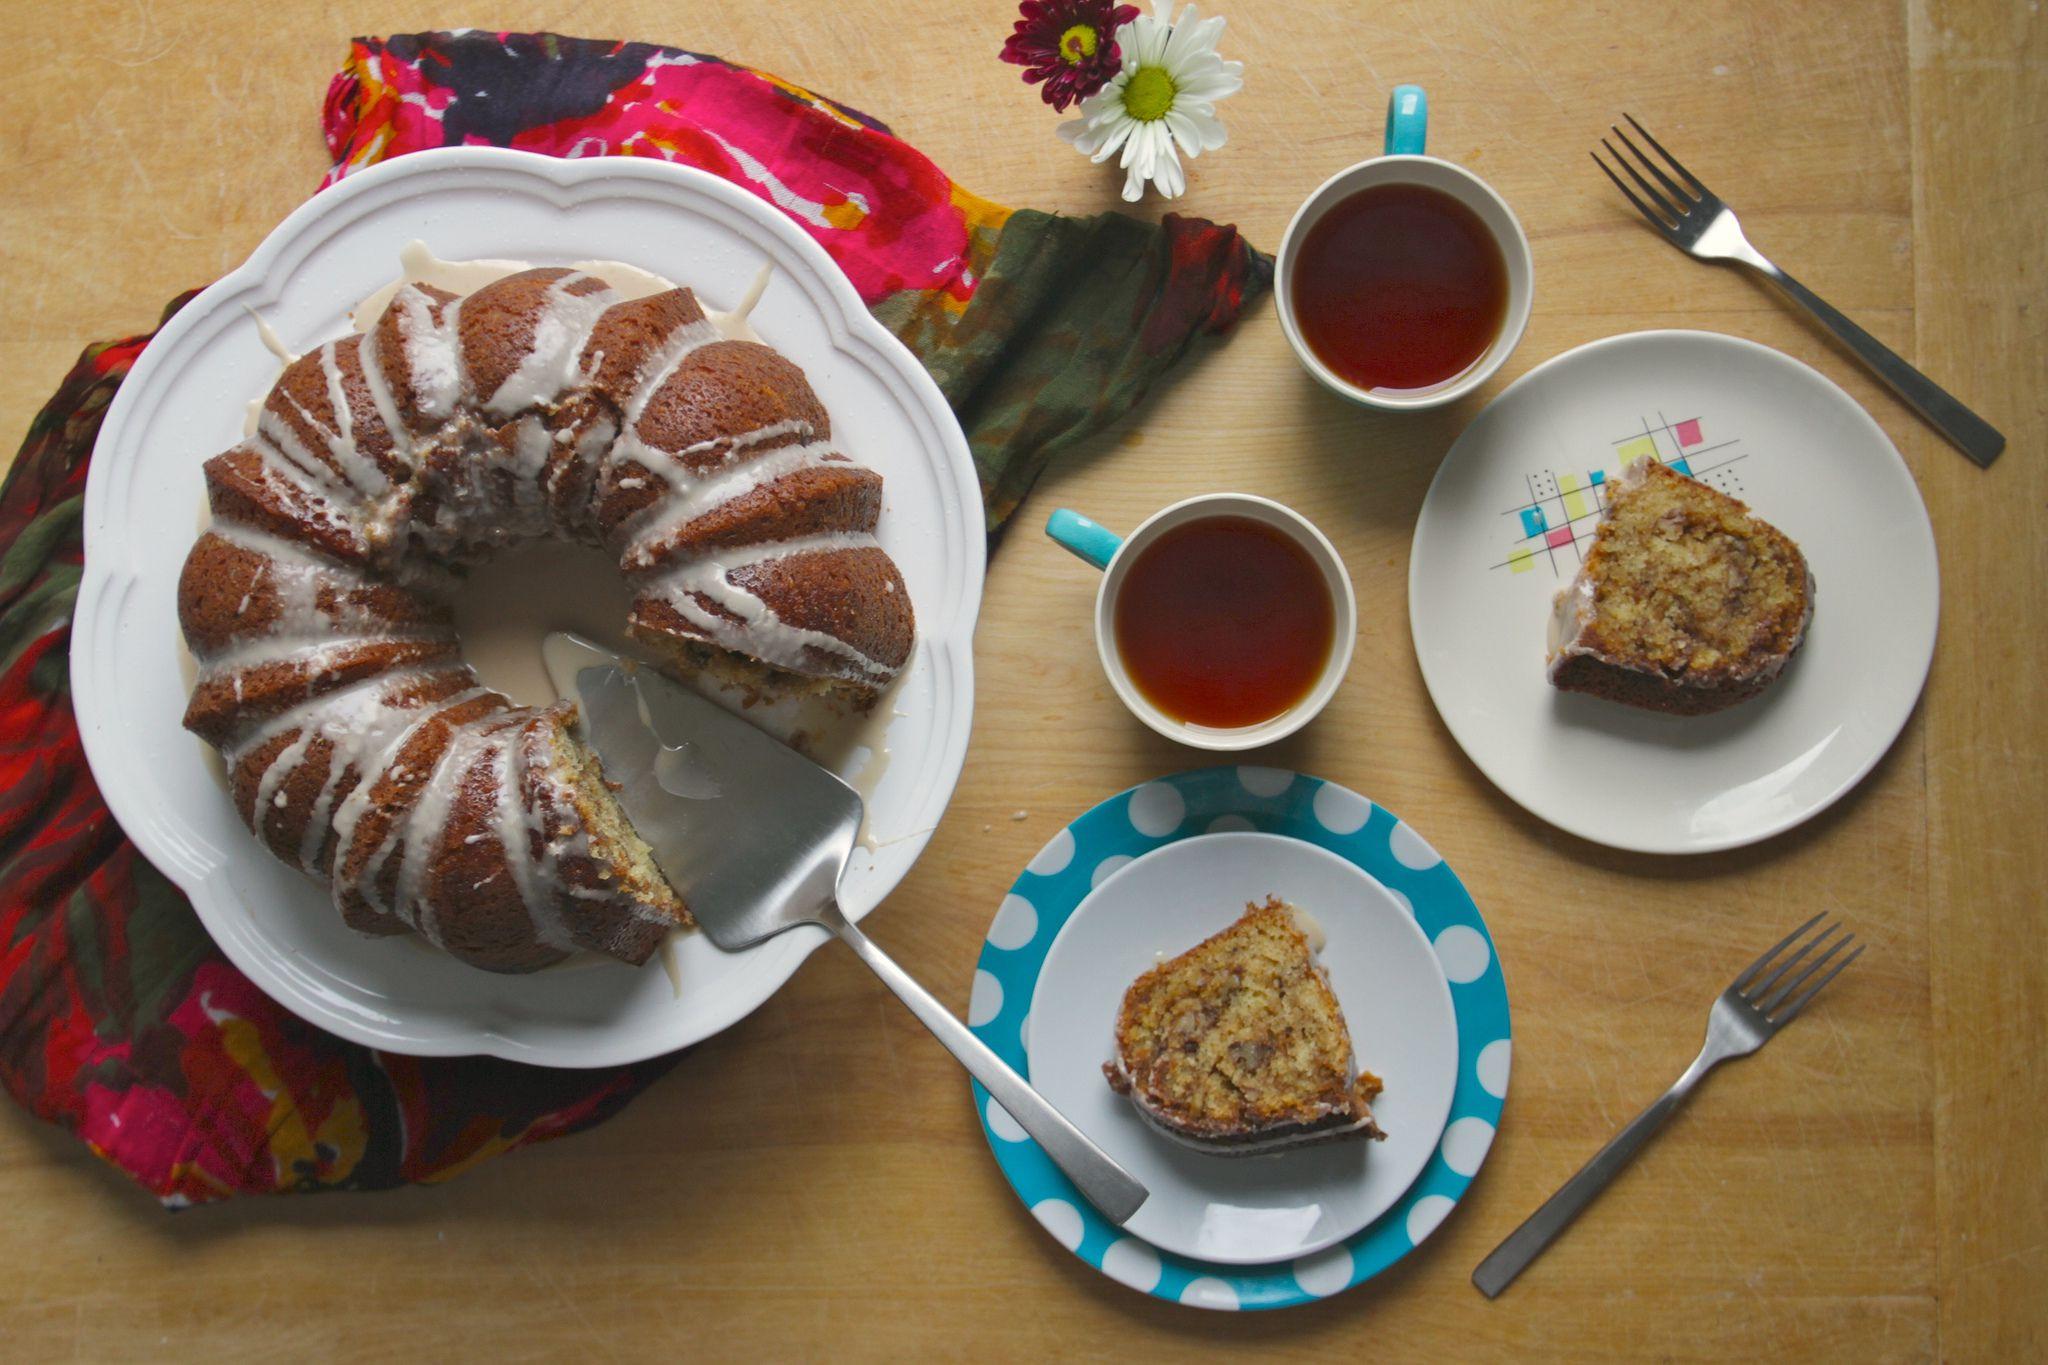 Yom Kippur Desserts  Giora Shimoni s Favorite Yom Kippur Break Fast Menu